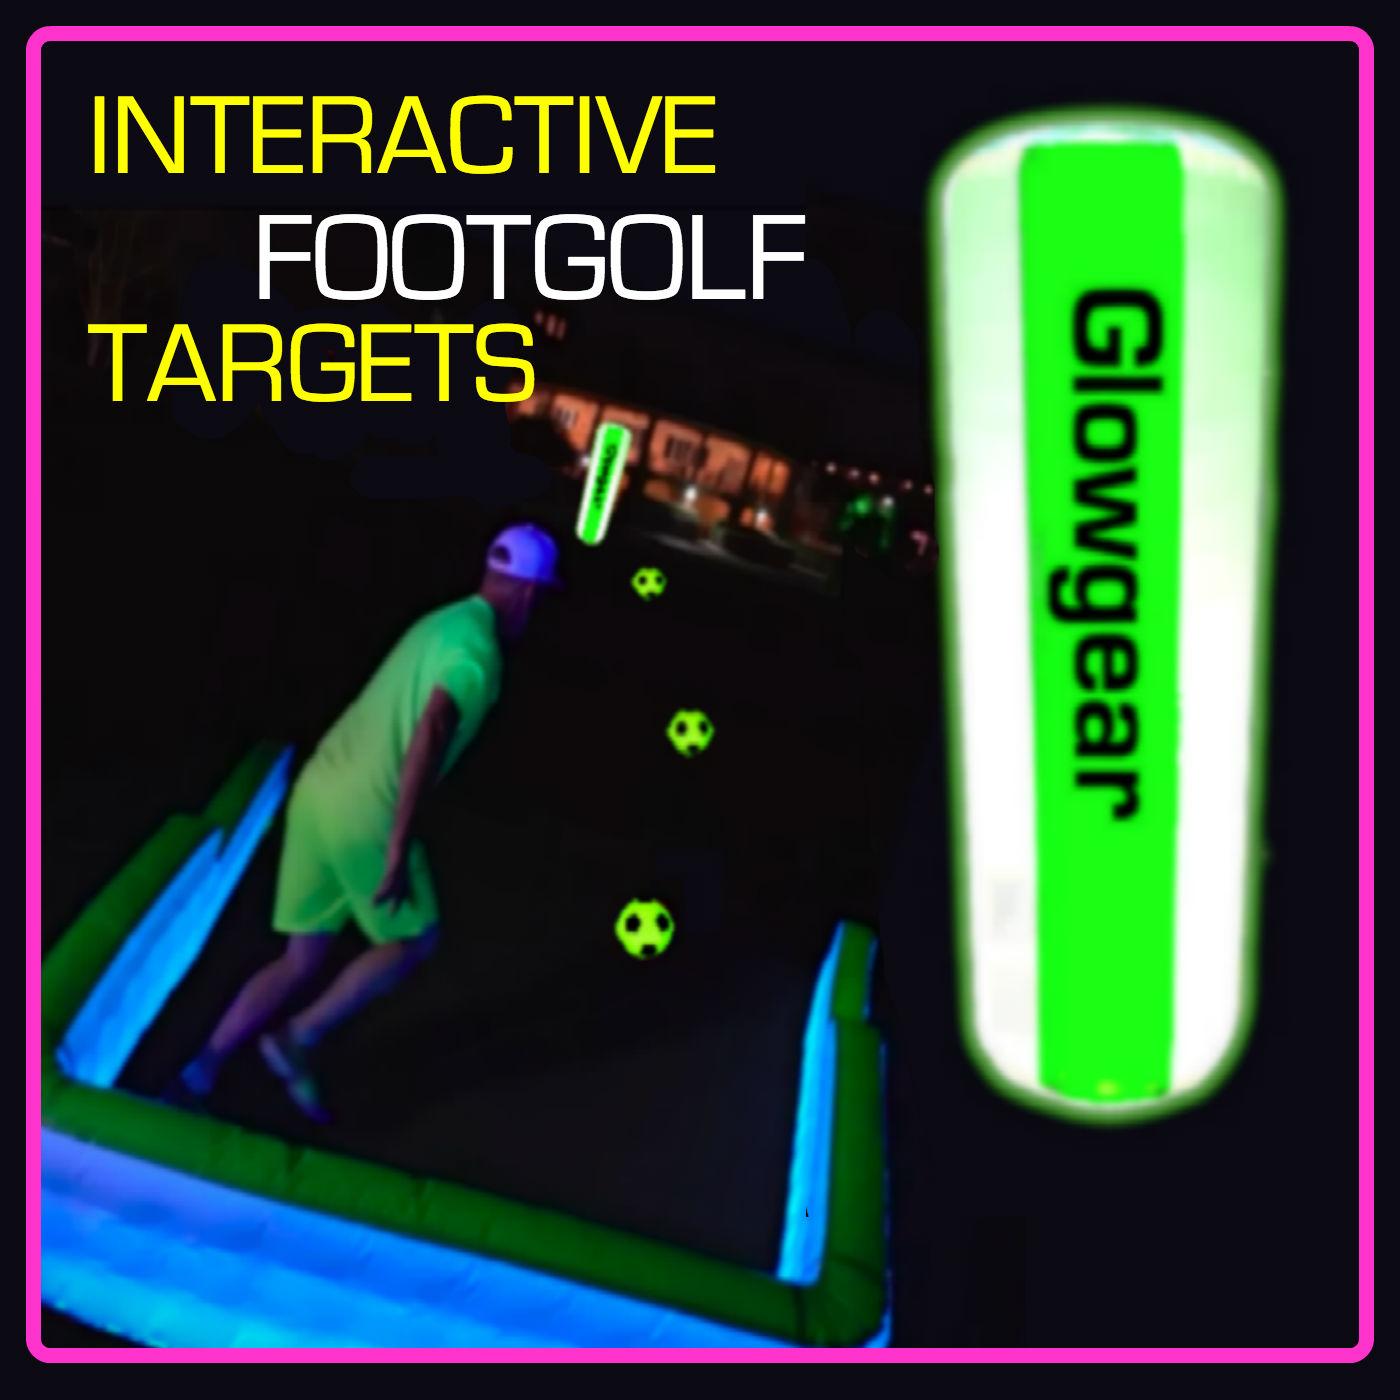 6.5ft Interactive Night & Foot Golf Target Pylon